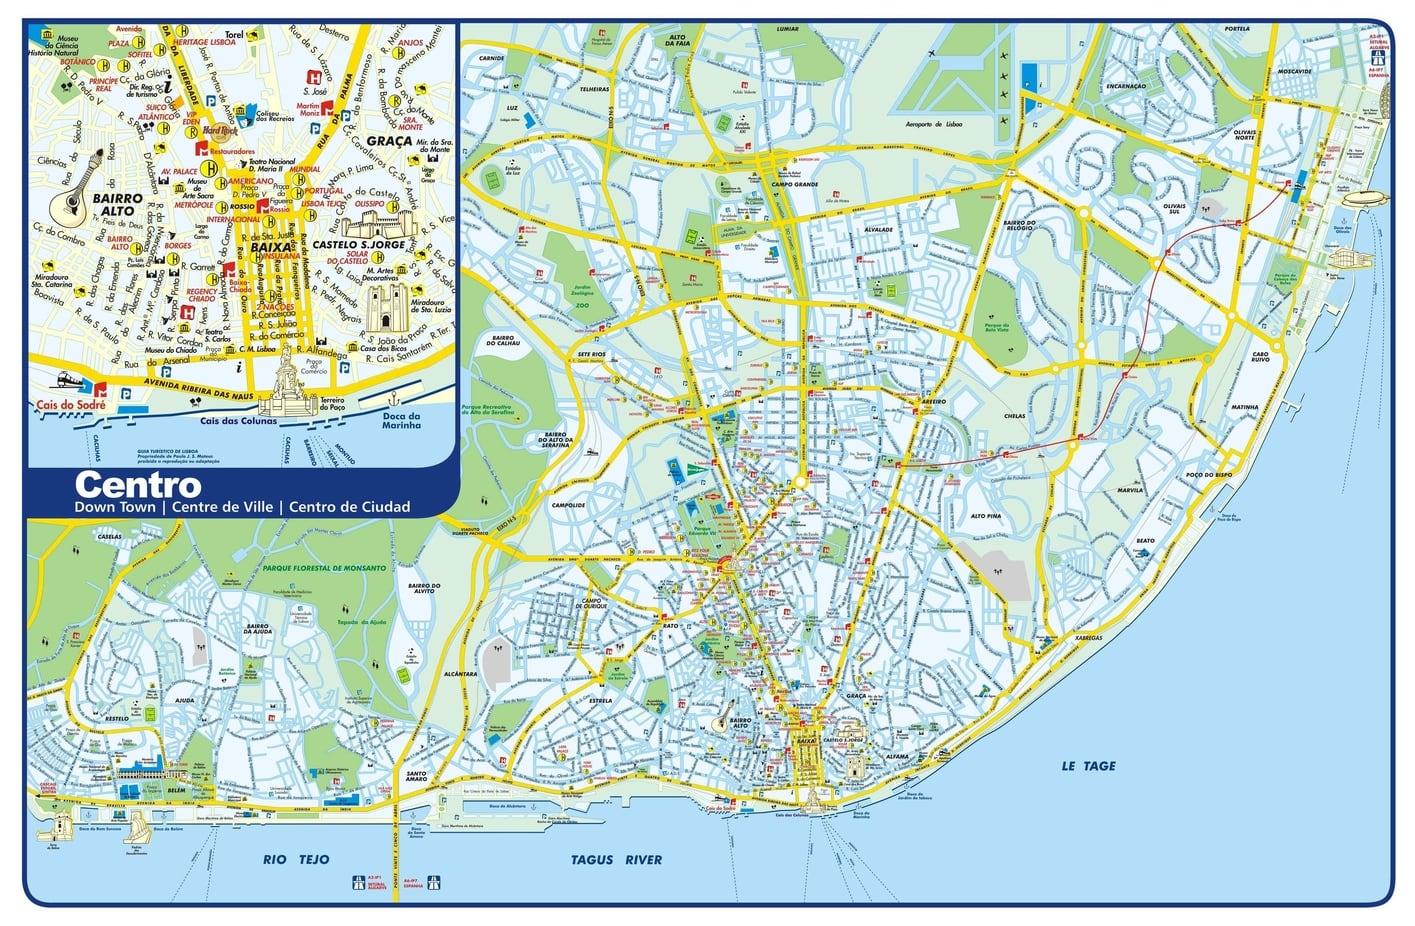 Lisbon Maps The Tourist Maps Of Lisbon To Plan Your Trip